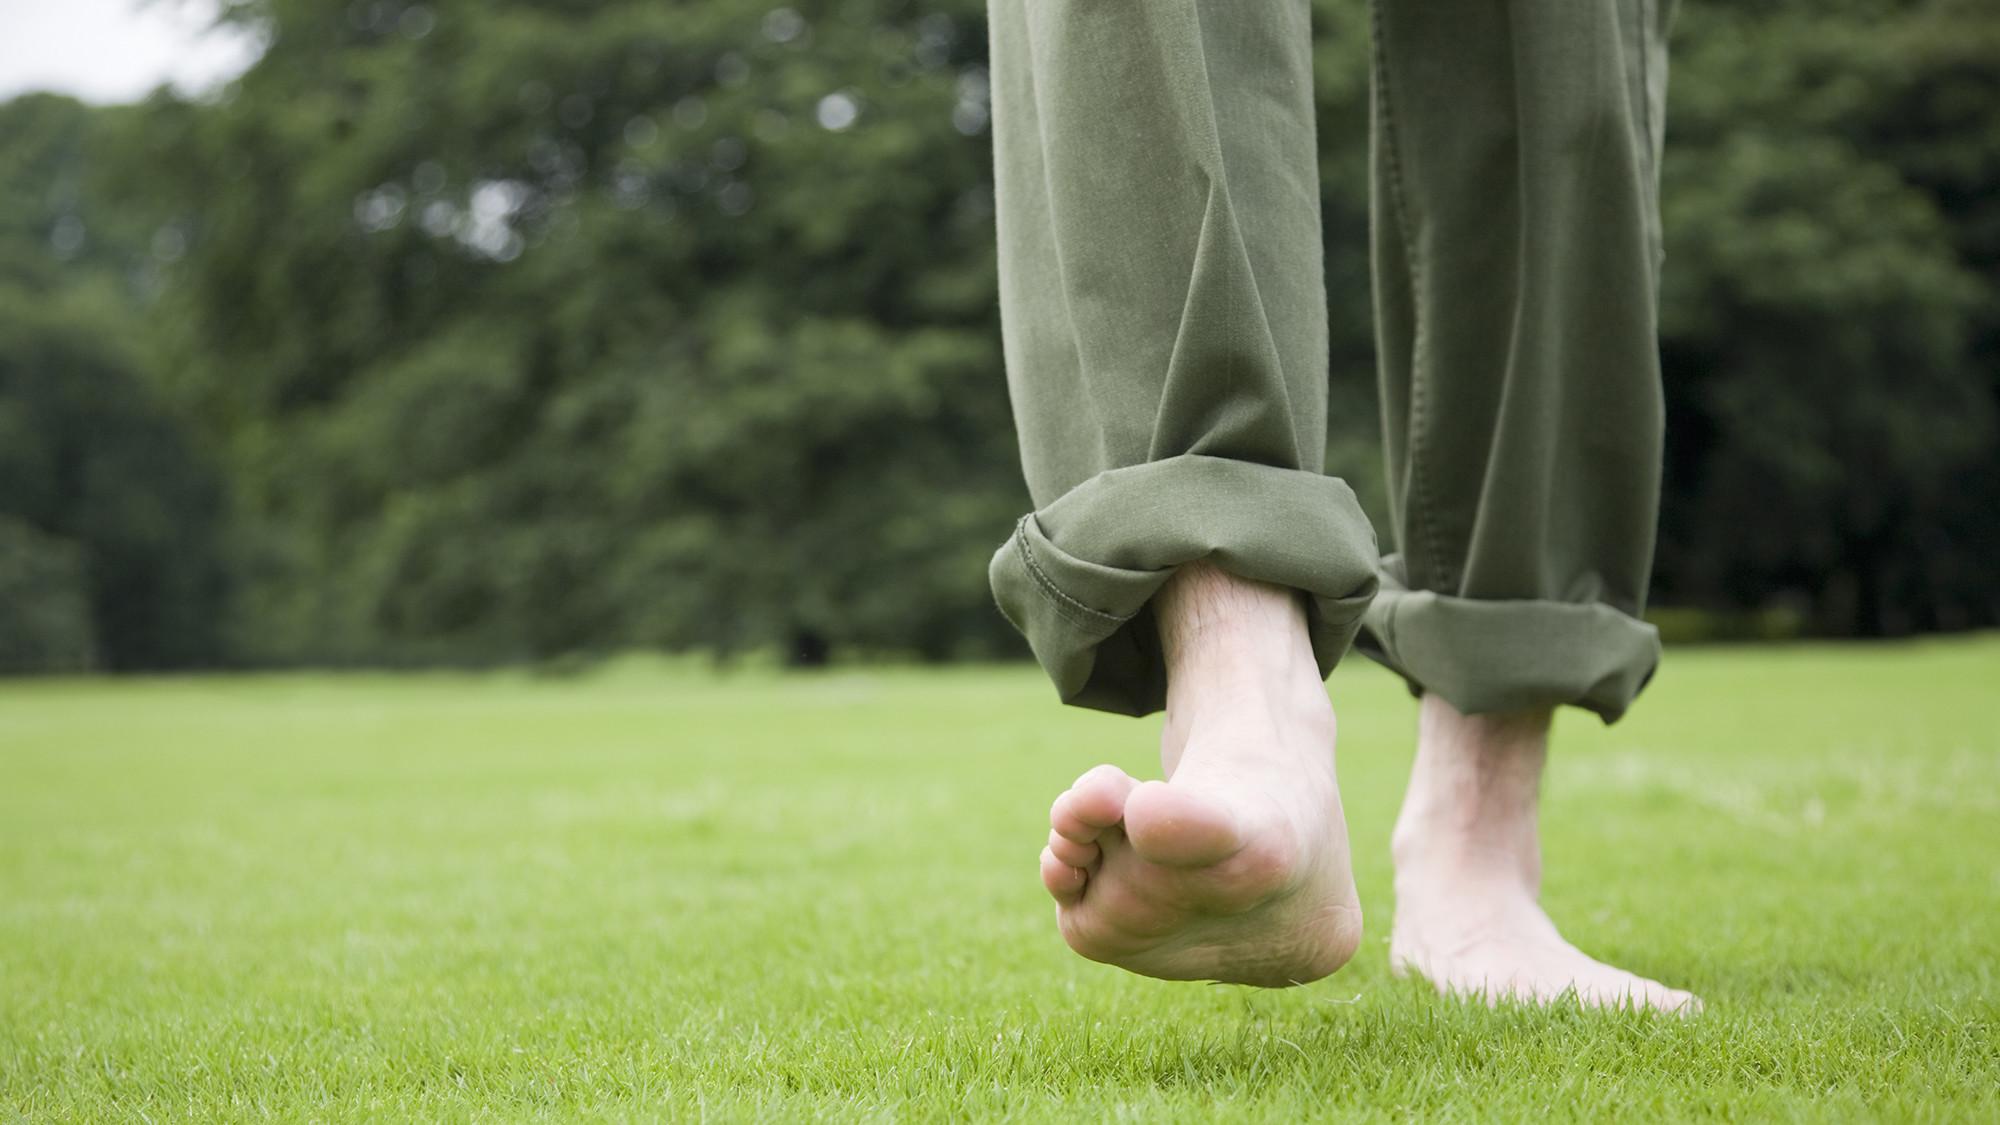 Image result for walking on dirt barefeet